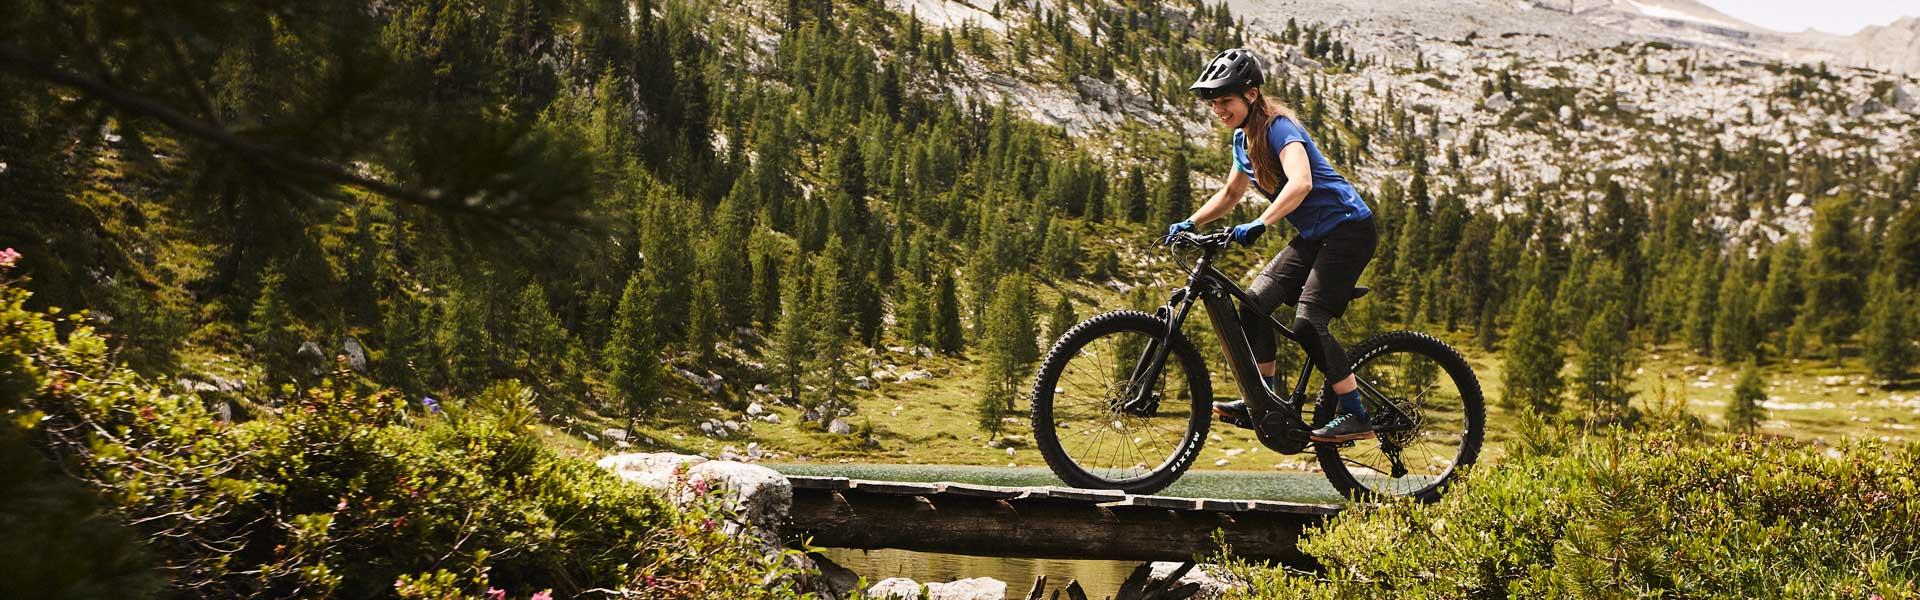 Vall E+ Pro Electric Bike